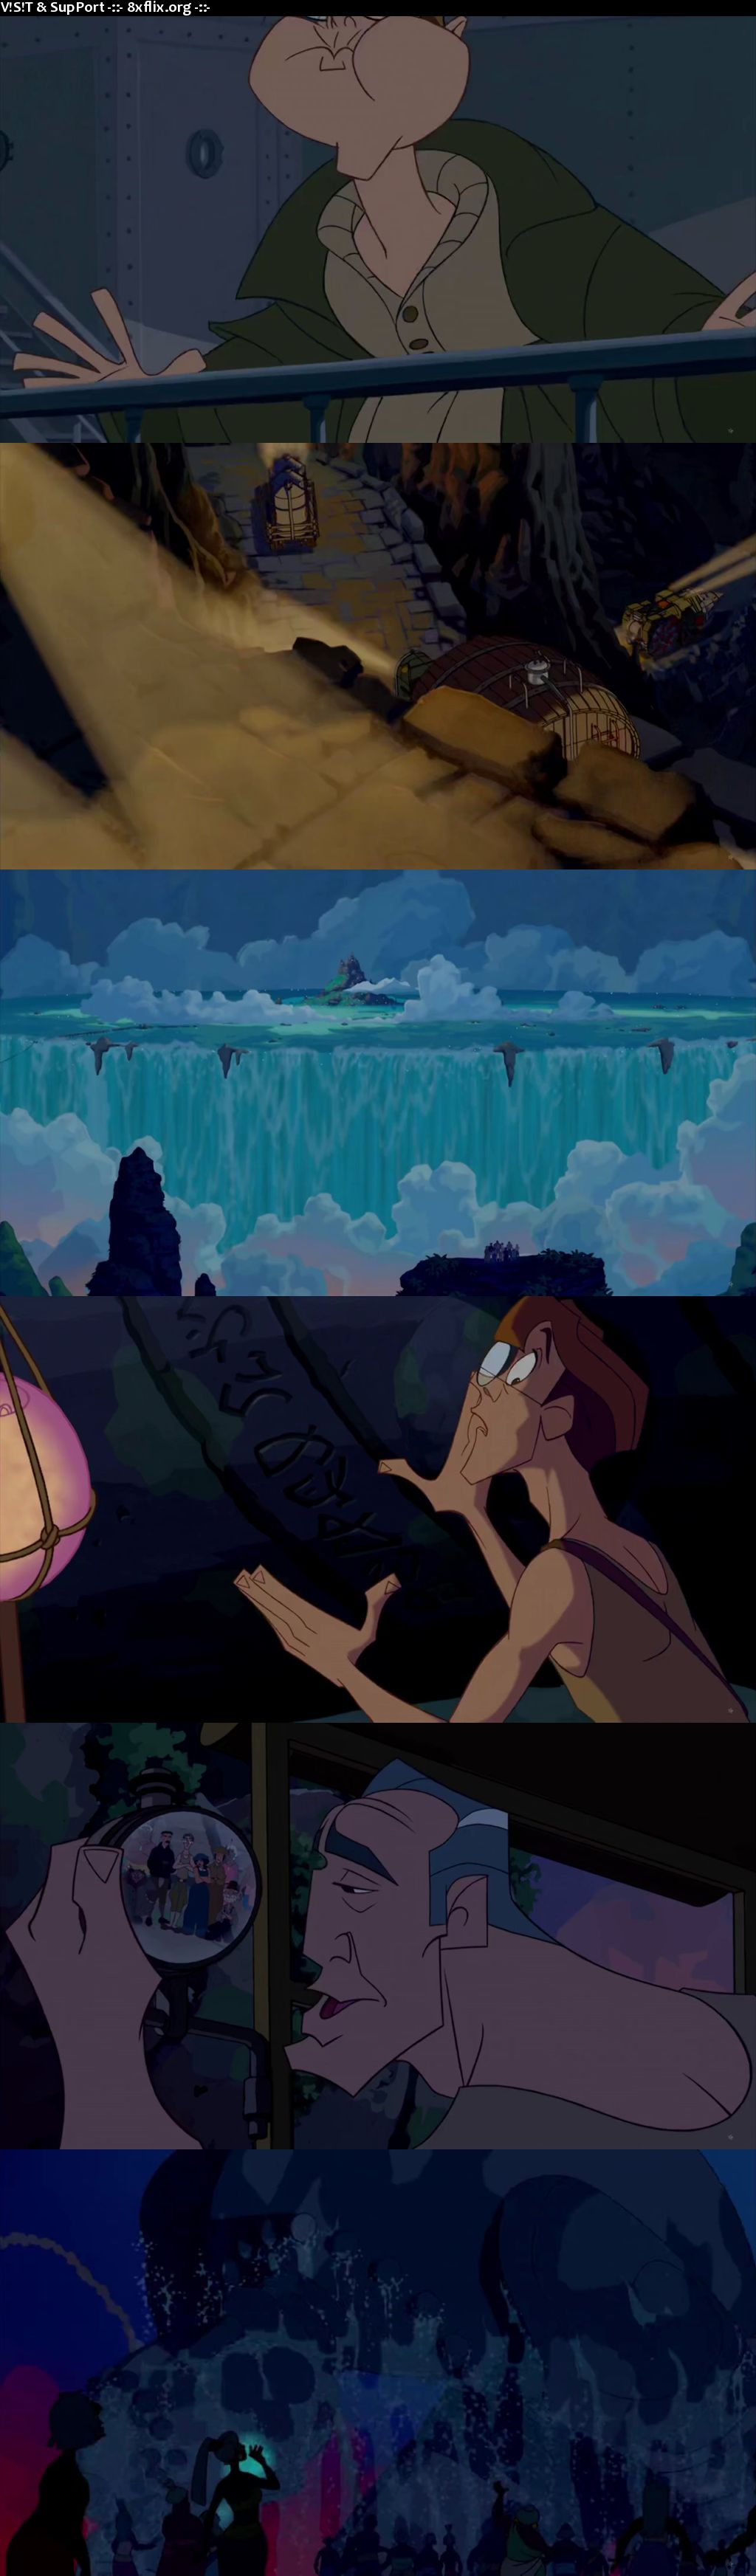 Atlantis The Lost Empire 2001 Hindi English Dual Audio 720p 480p BluRay